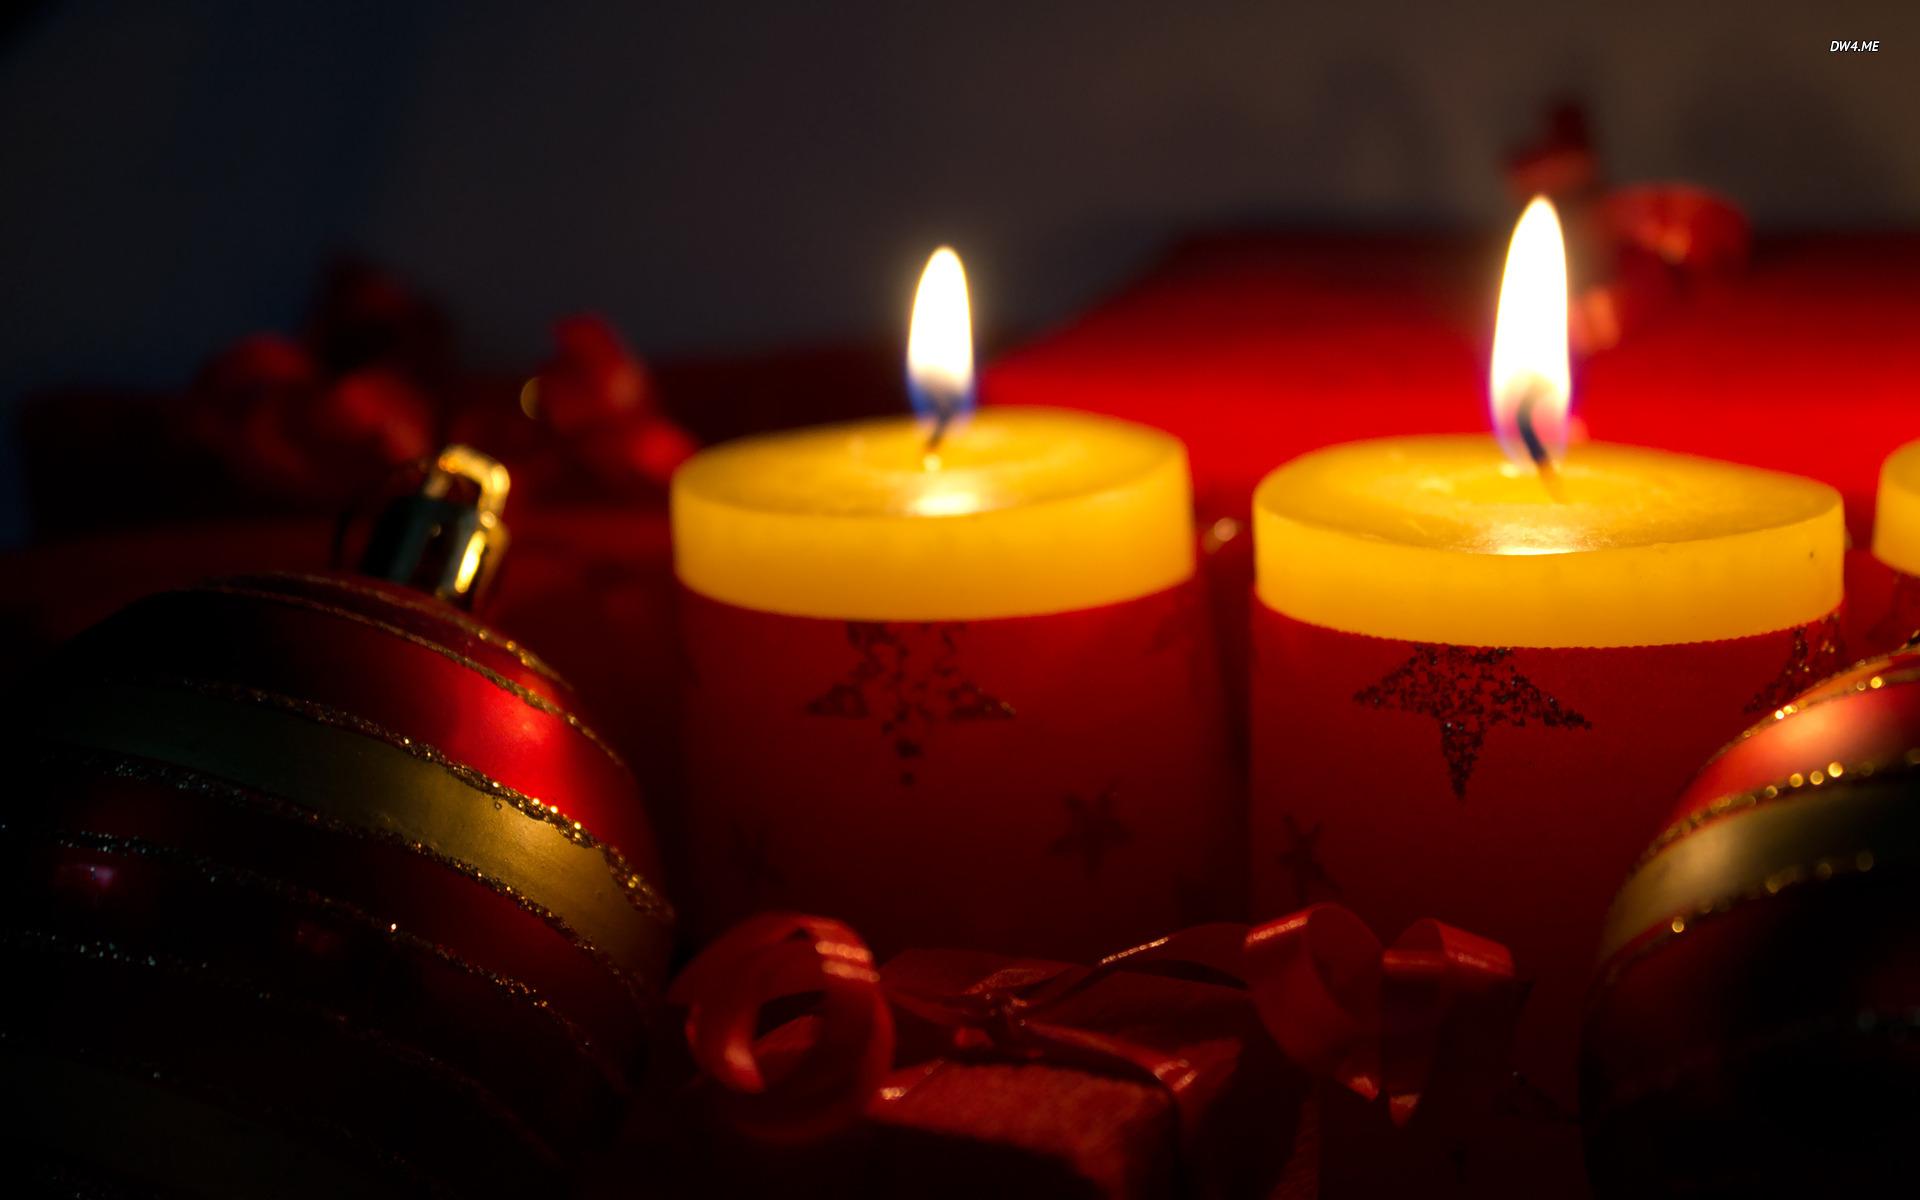 Christmas candles wallpaper 1920x1200